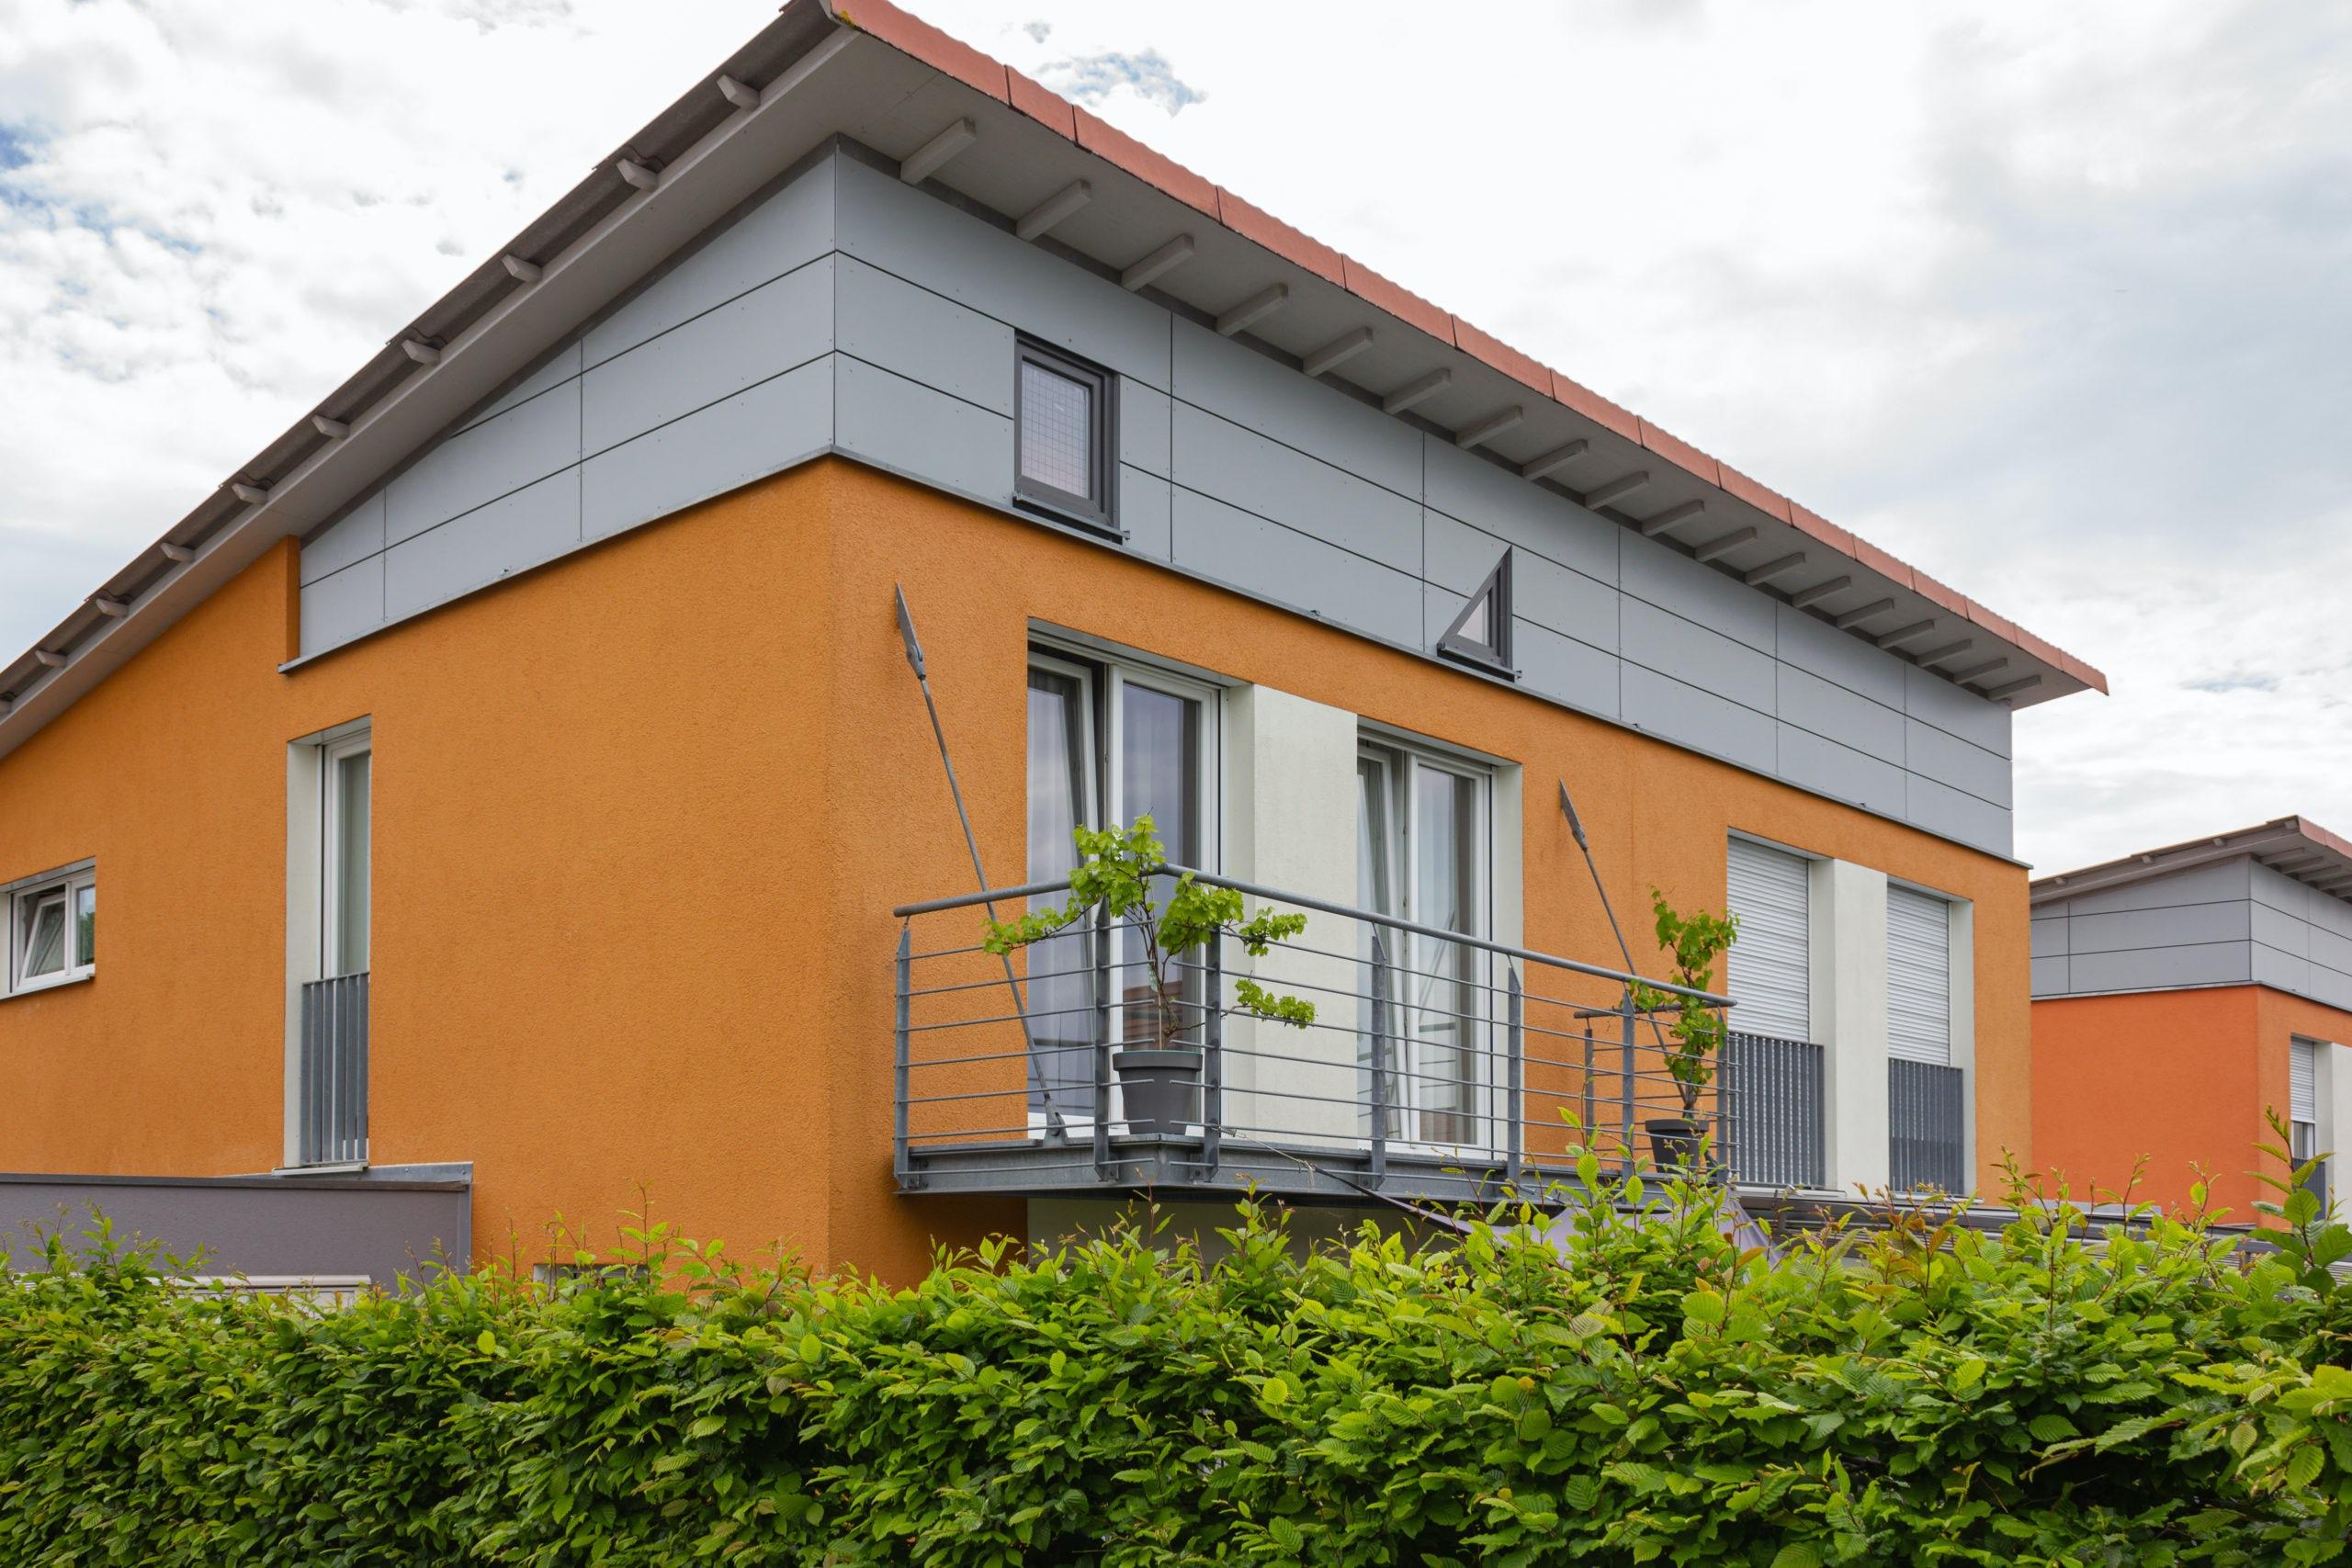 mid century modern roofline